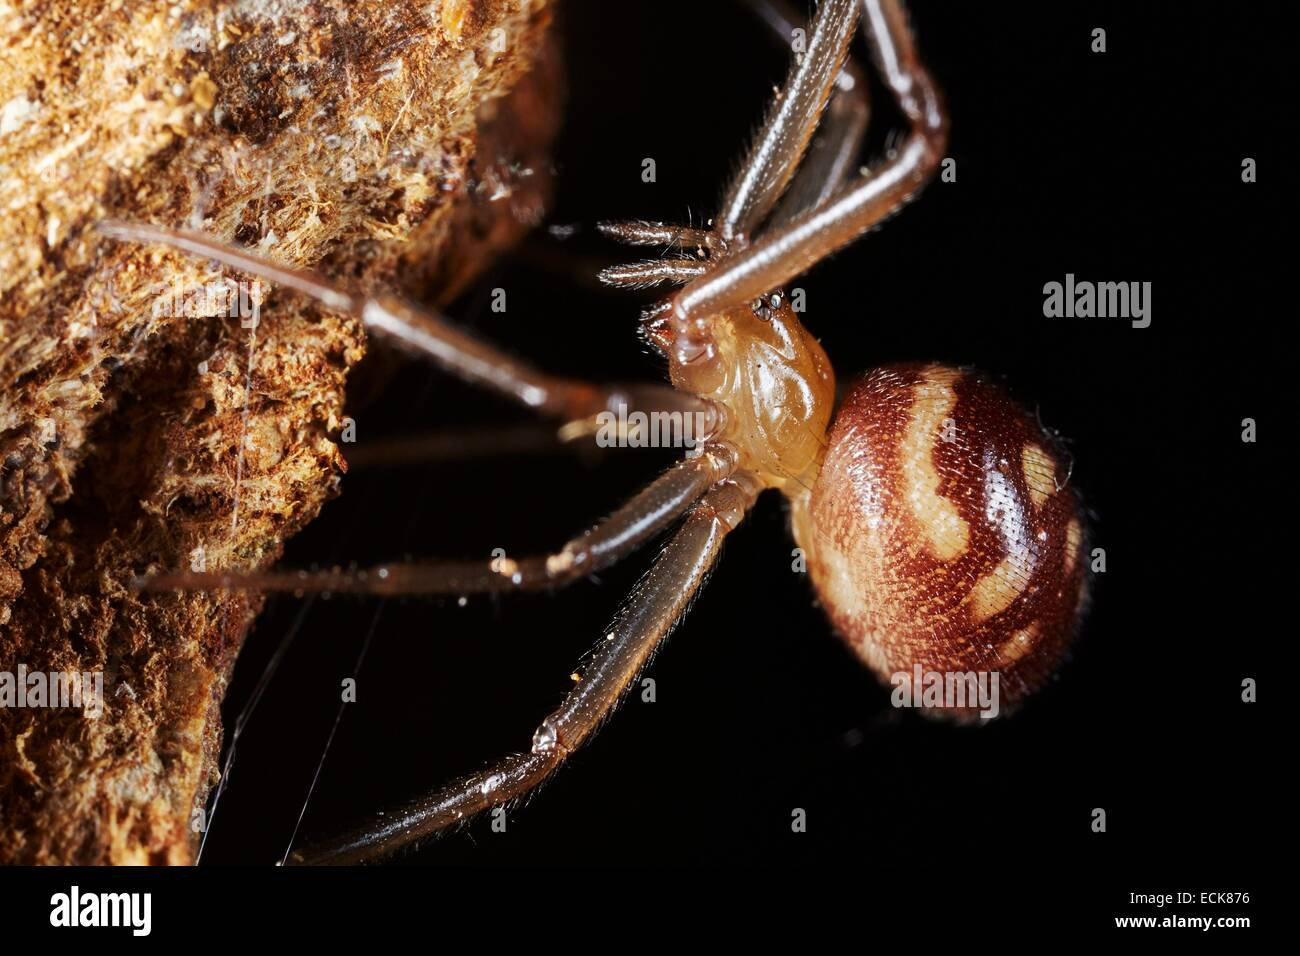 France, Paris, Araneae, Theridiidae, Dark comb-footed spider(Steatoda grossa), female - Stock Image